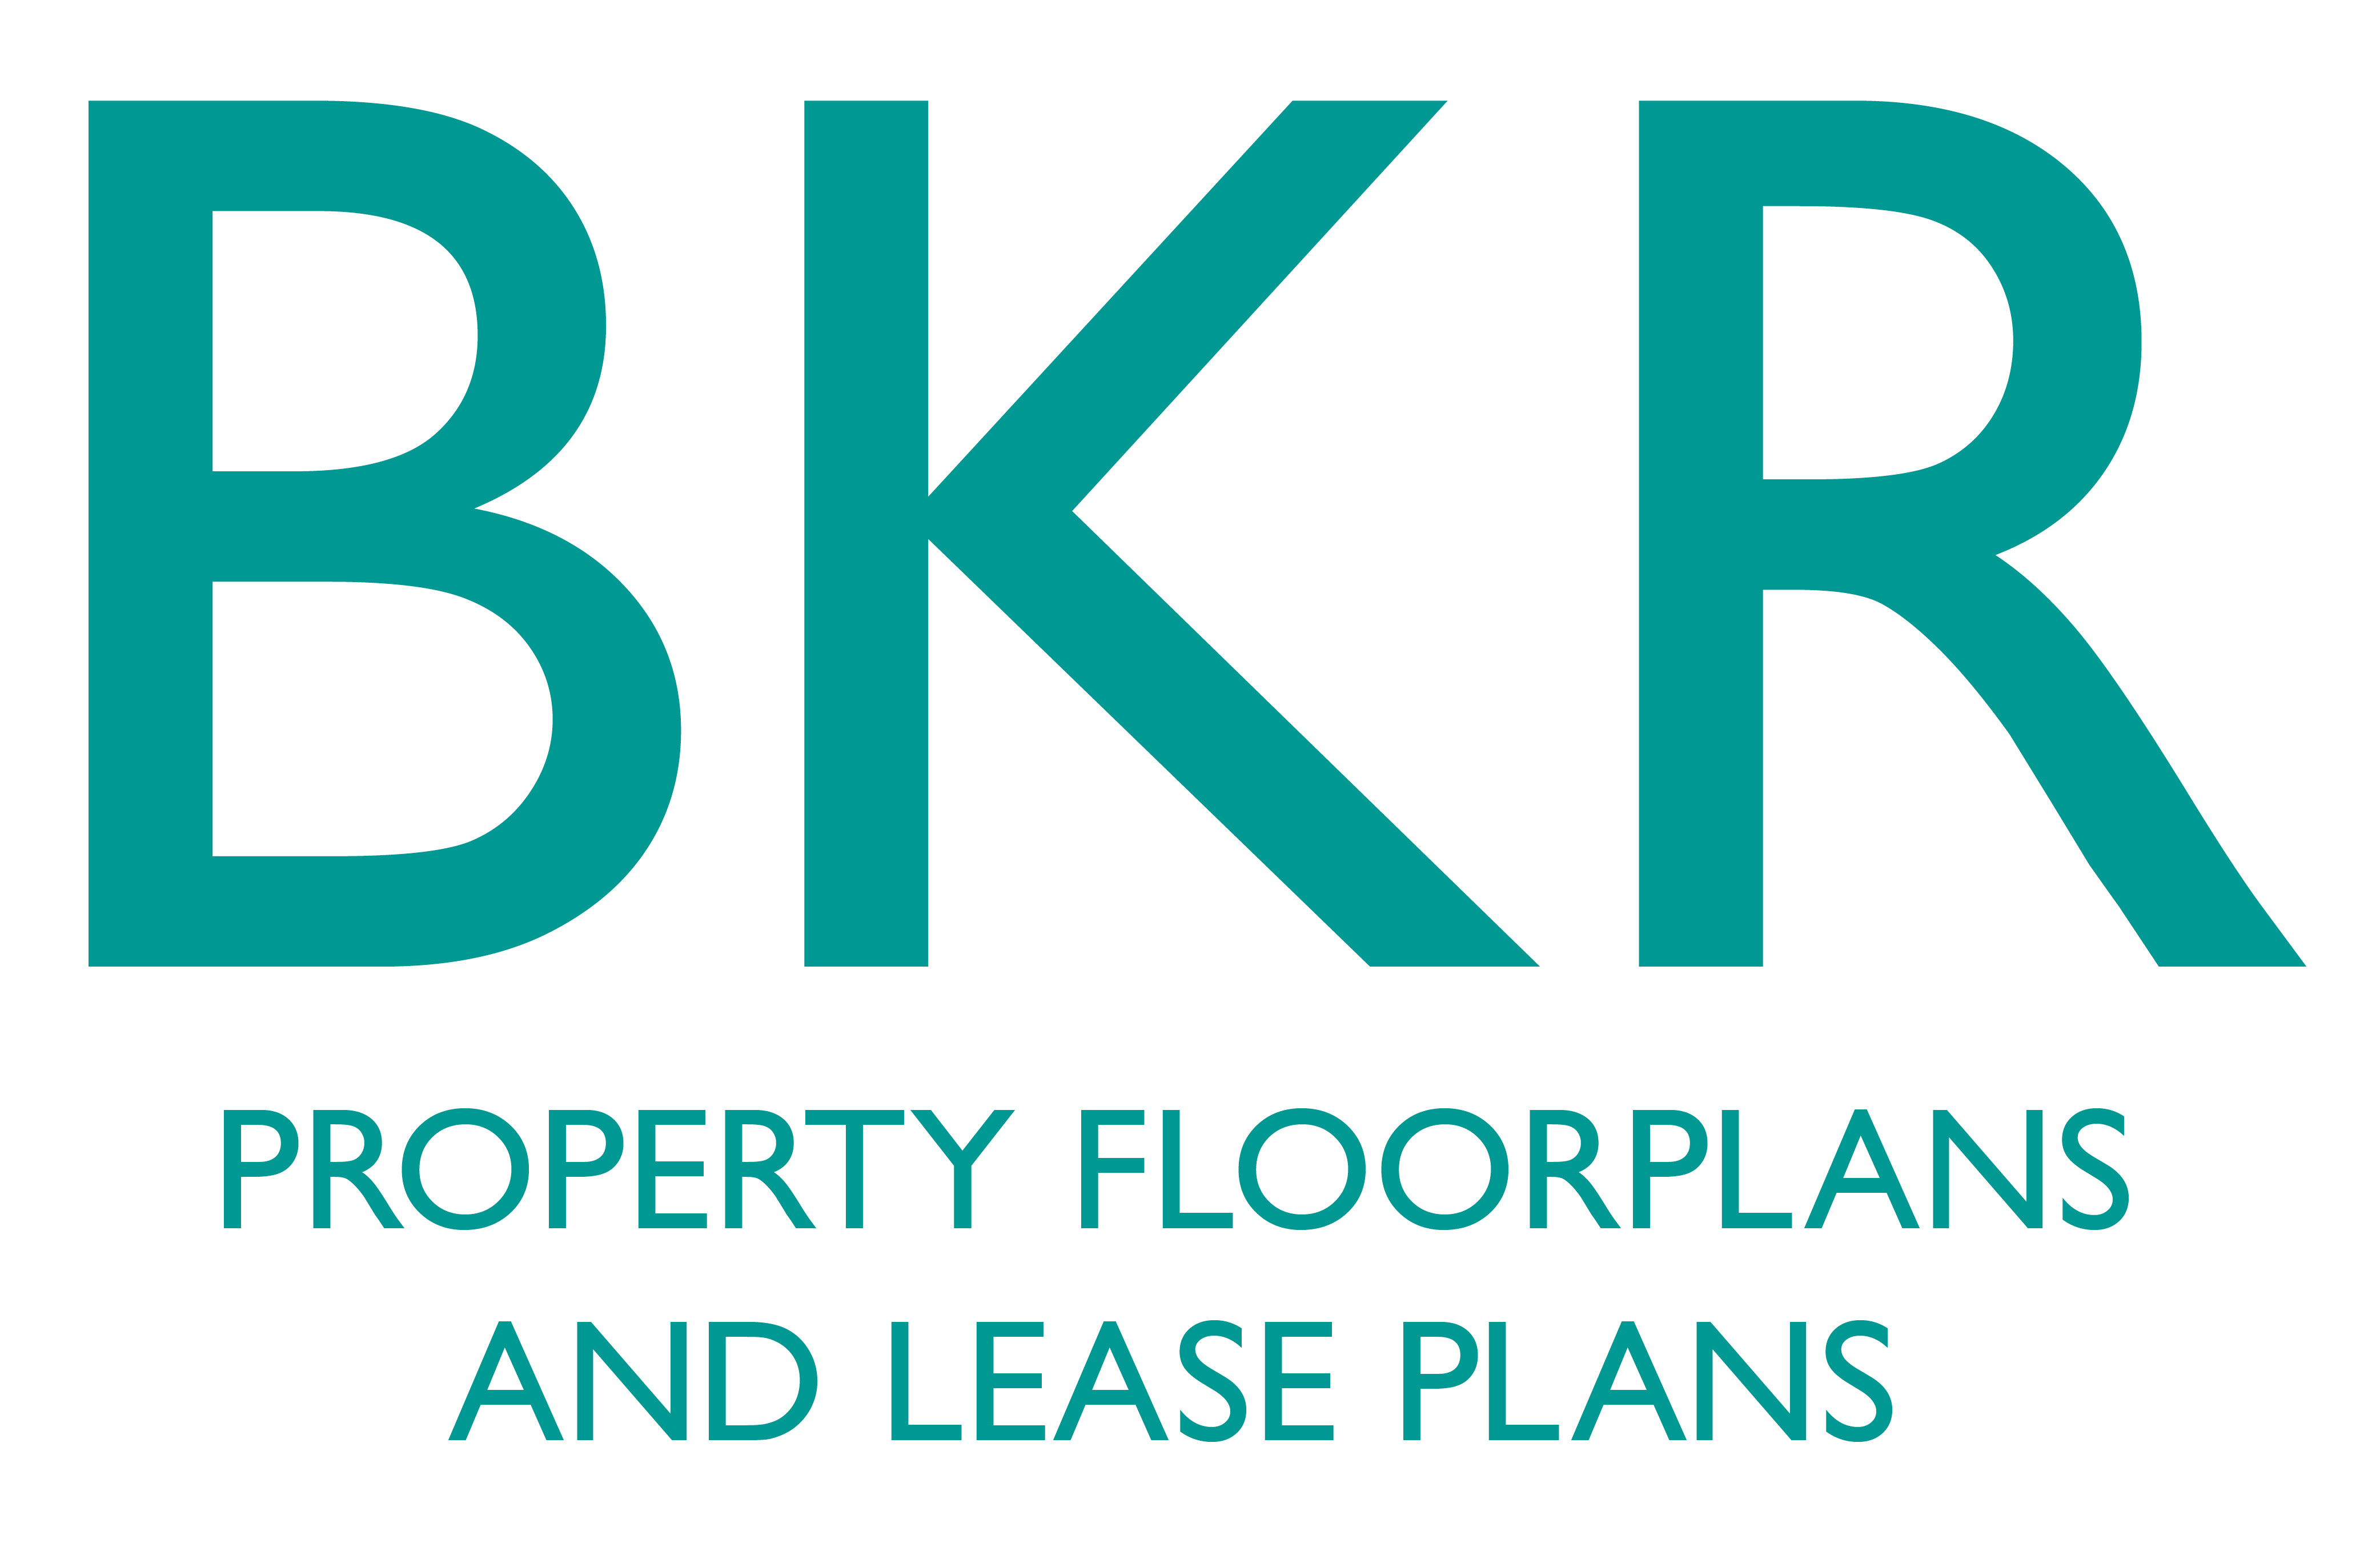 BKR Floorplans